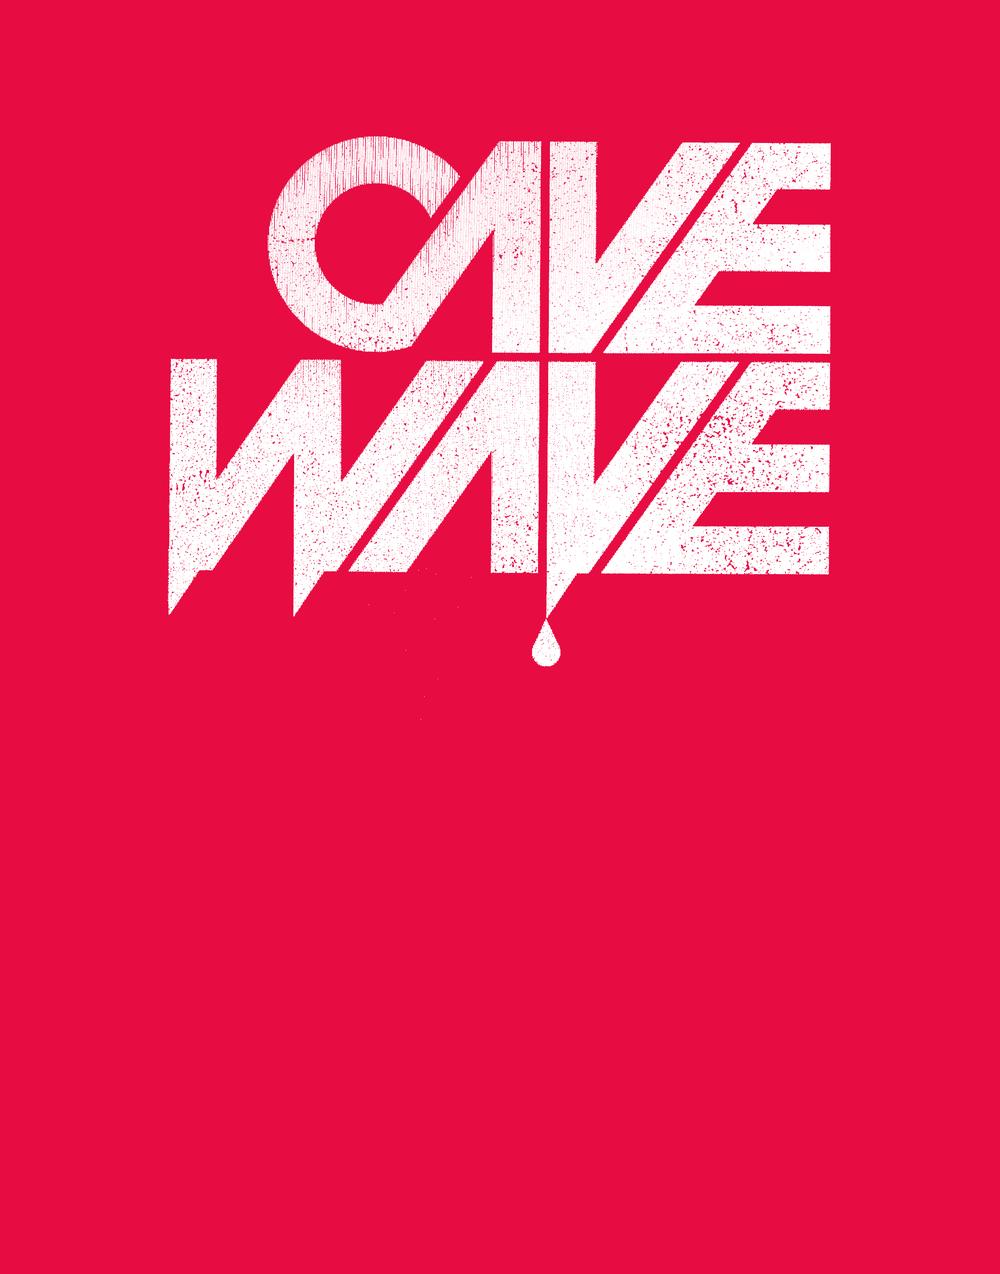 CaveWave_Red_Justin-Harder.png